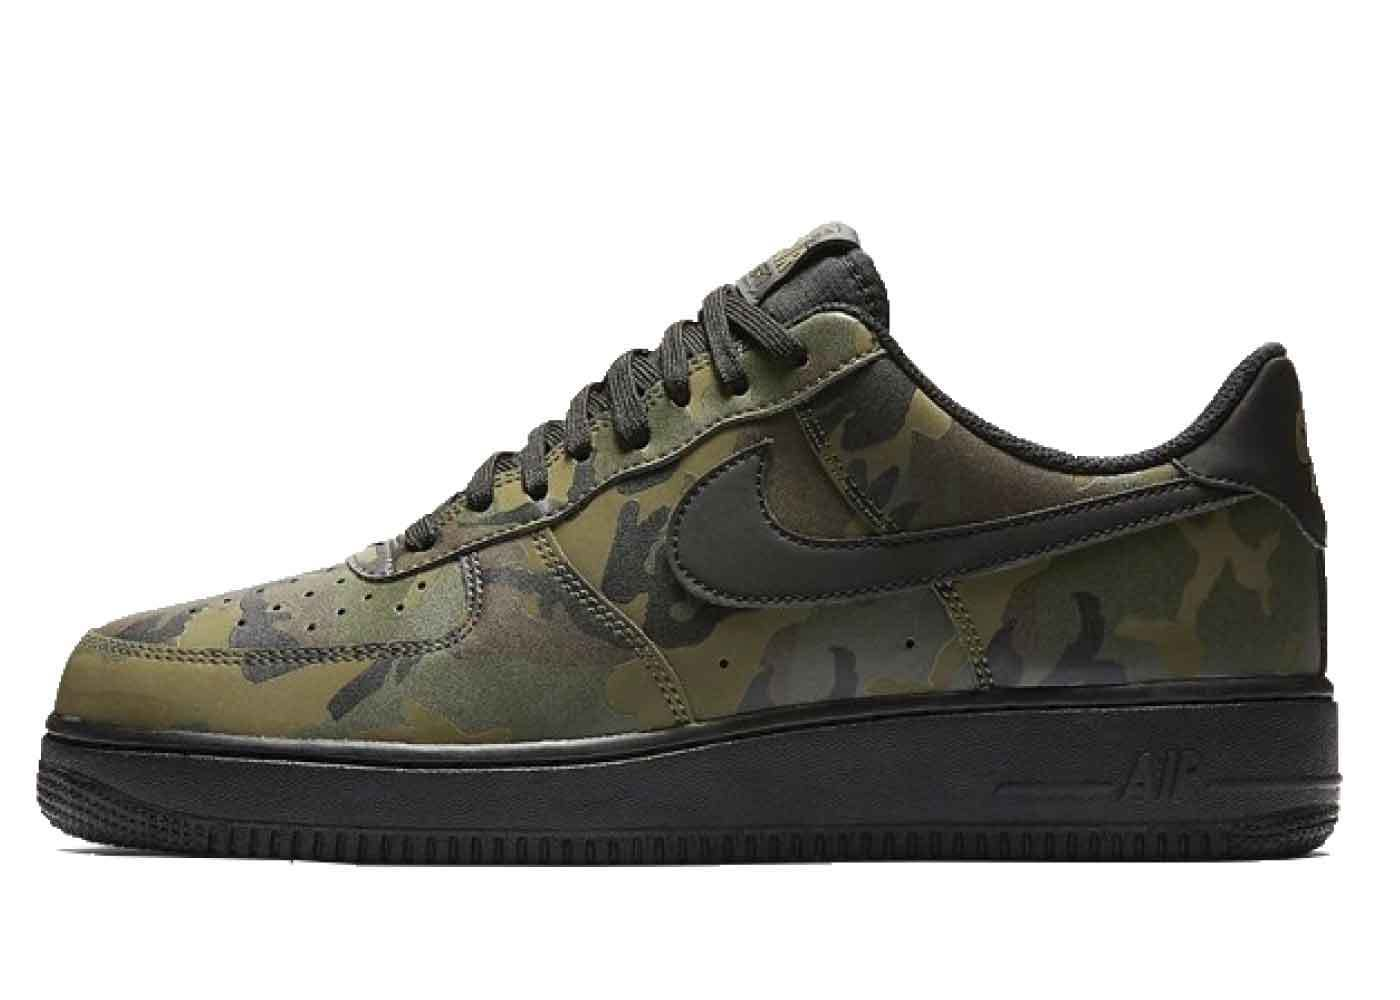 Nike Air Force 1 Low Reflective Camo 相